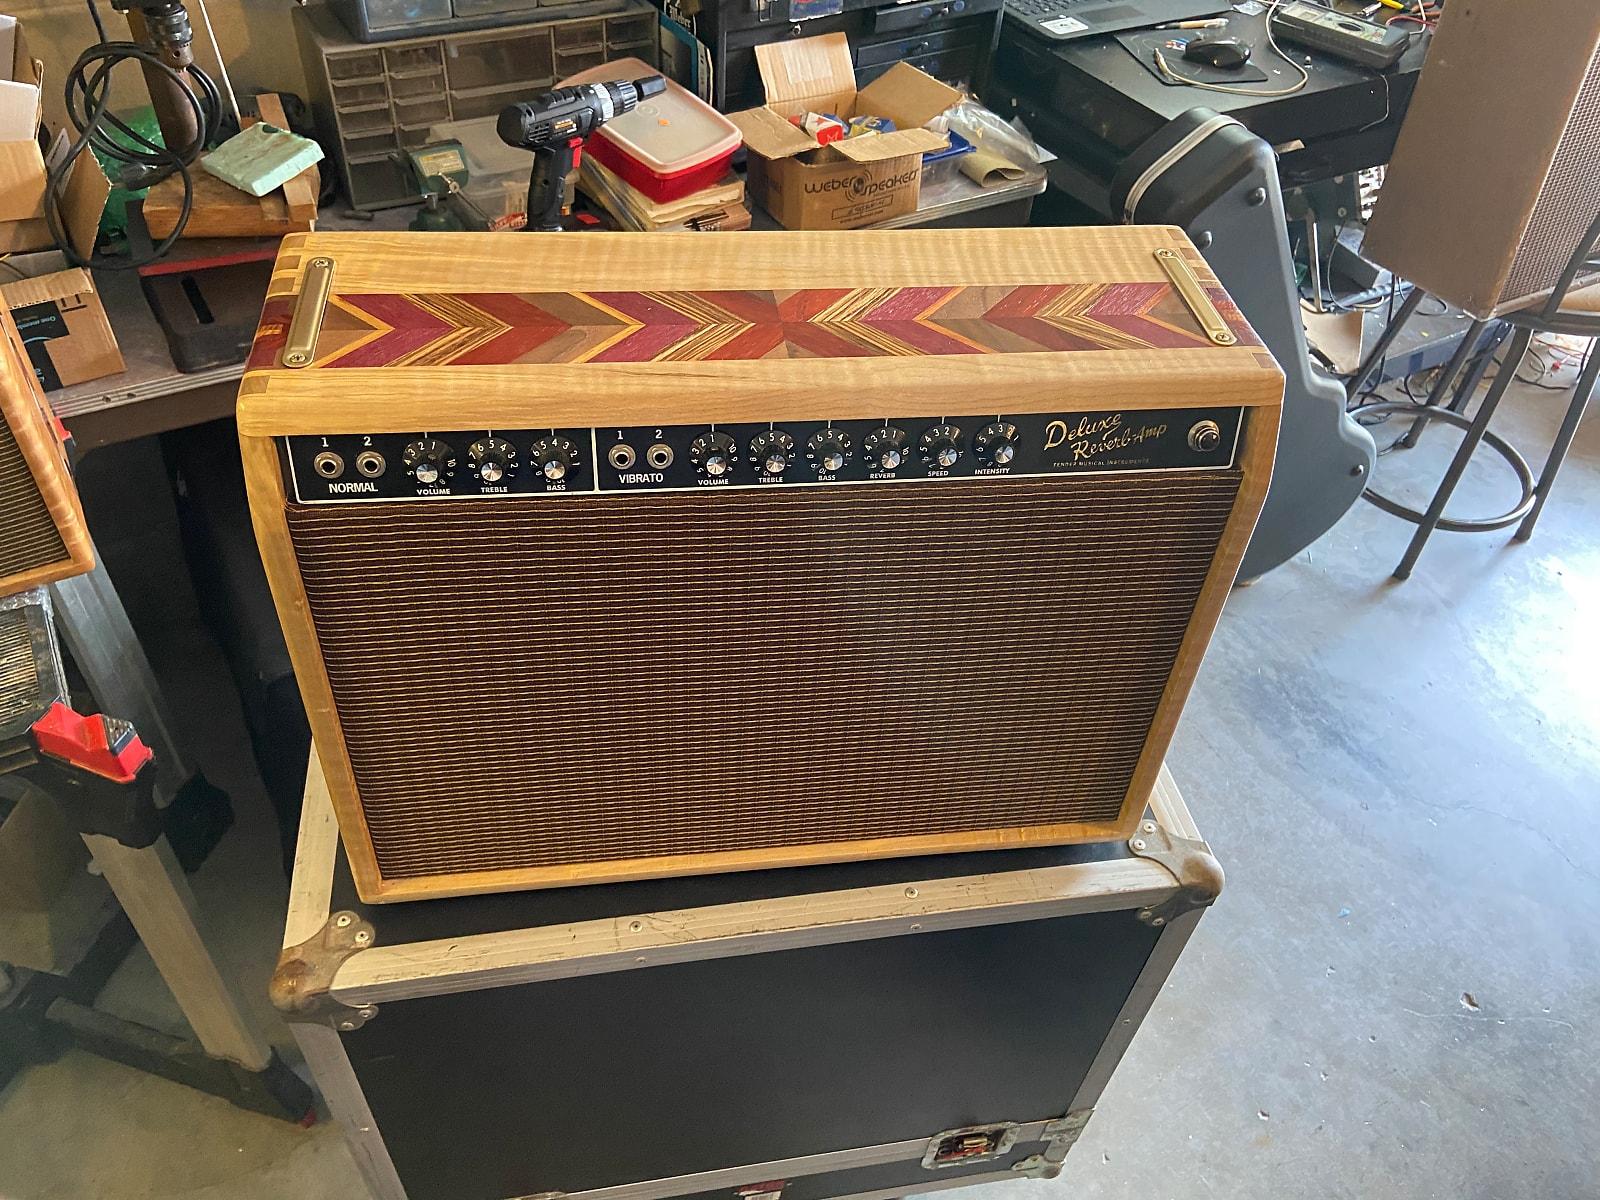 Customized Fender Deluxe Reverb